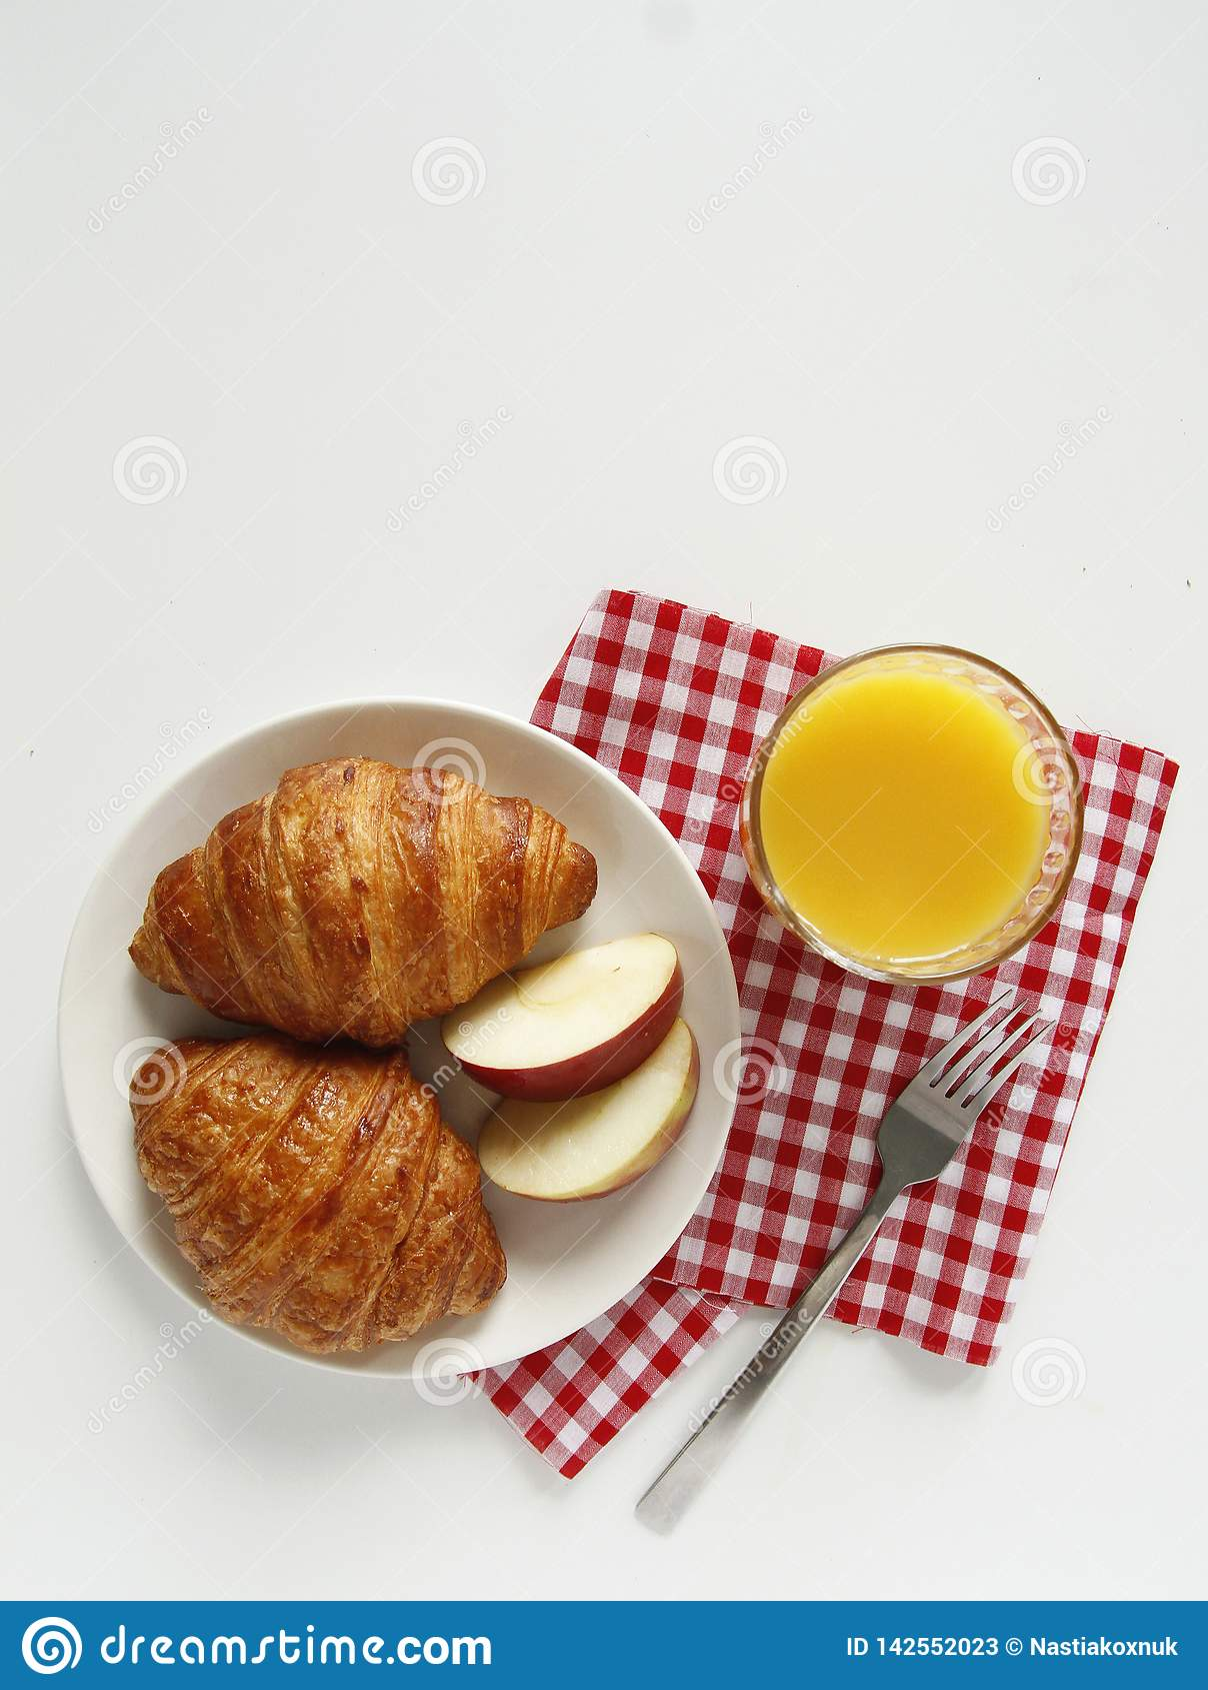 Breakfast. top view. croissant, orange juice